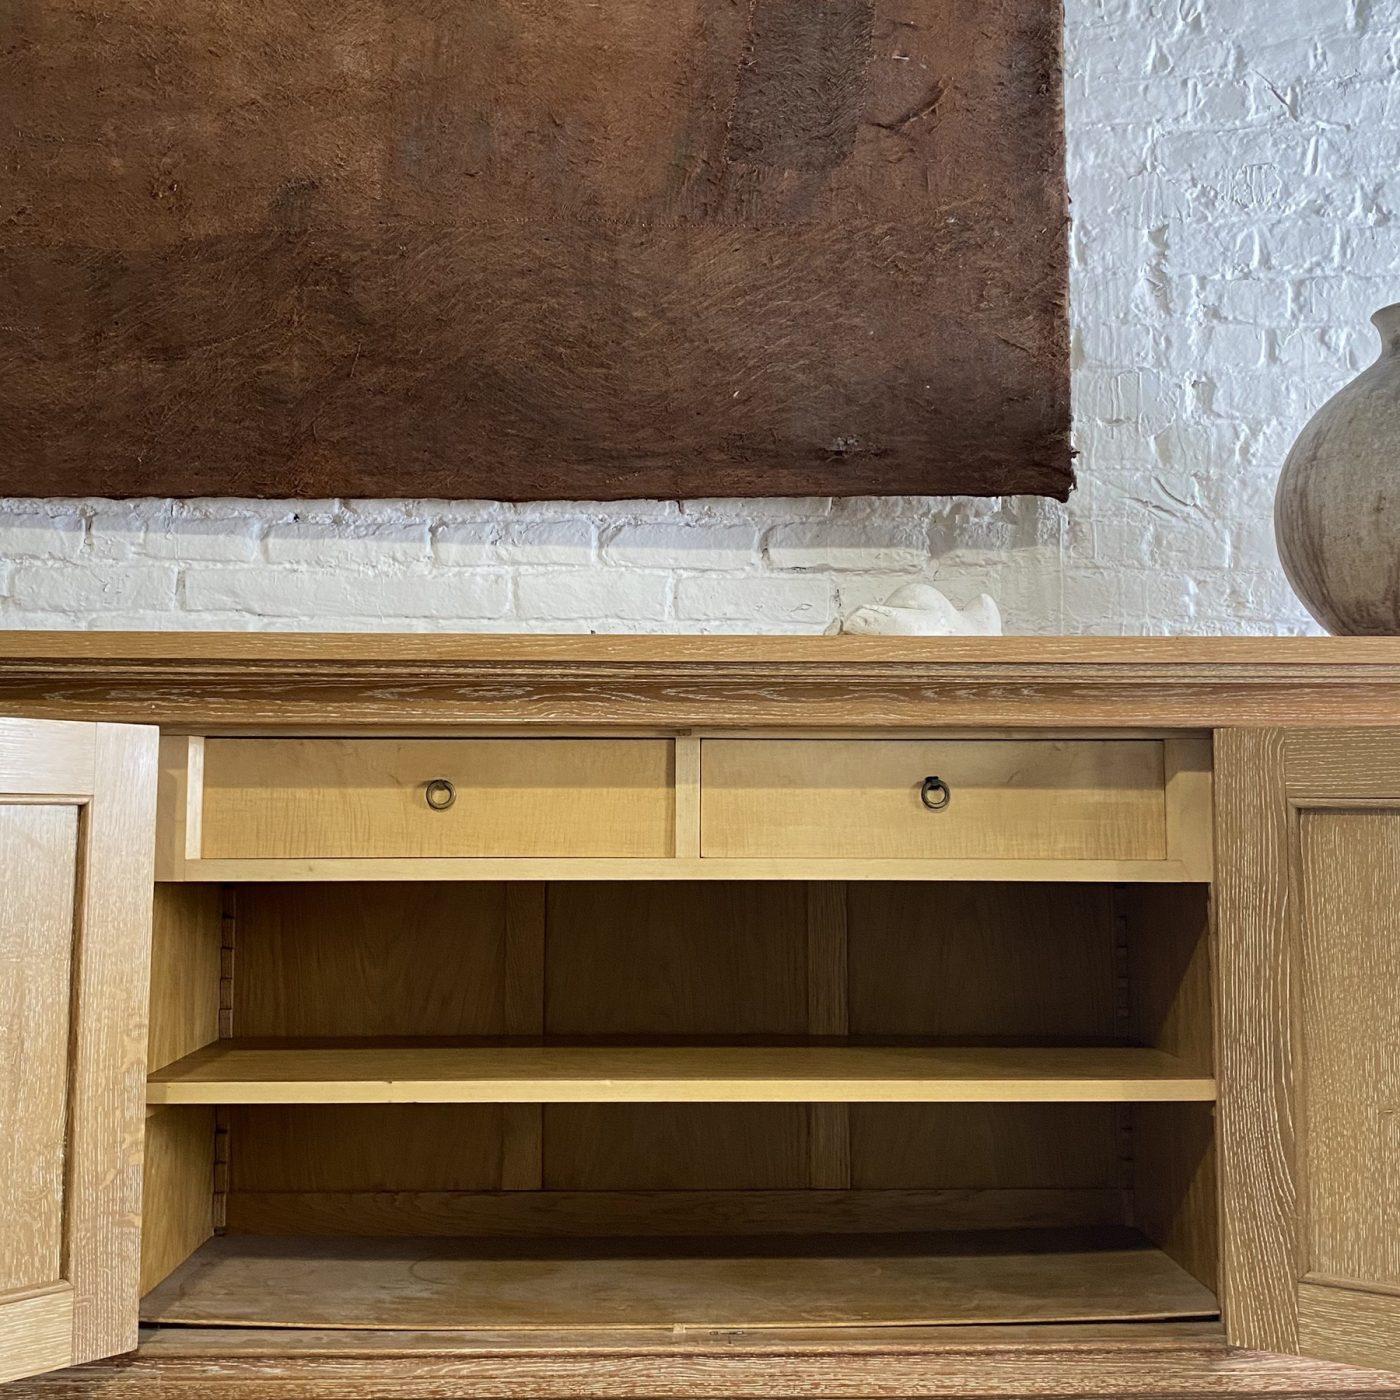 objet-vagabond-oak-sideboard0002